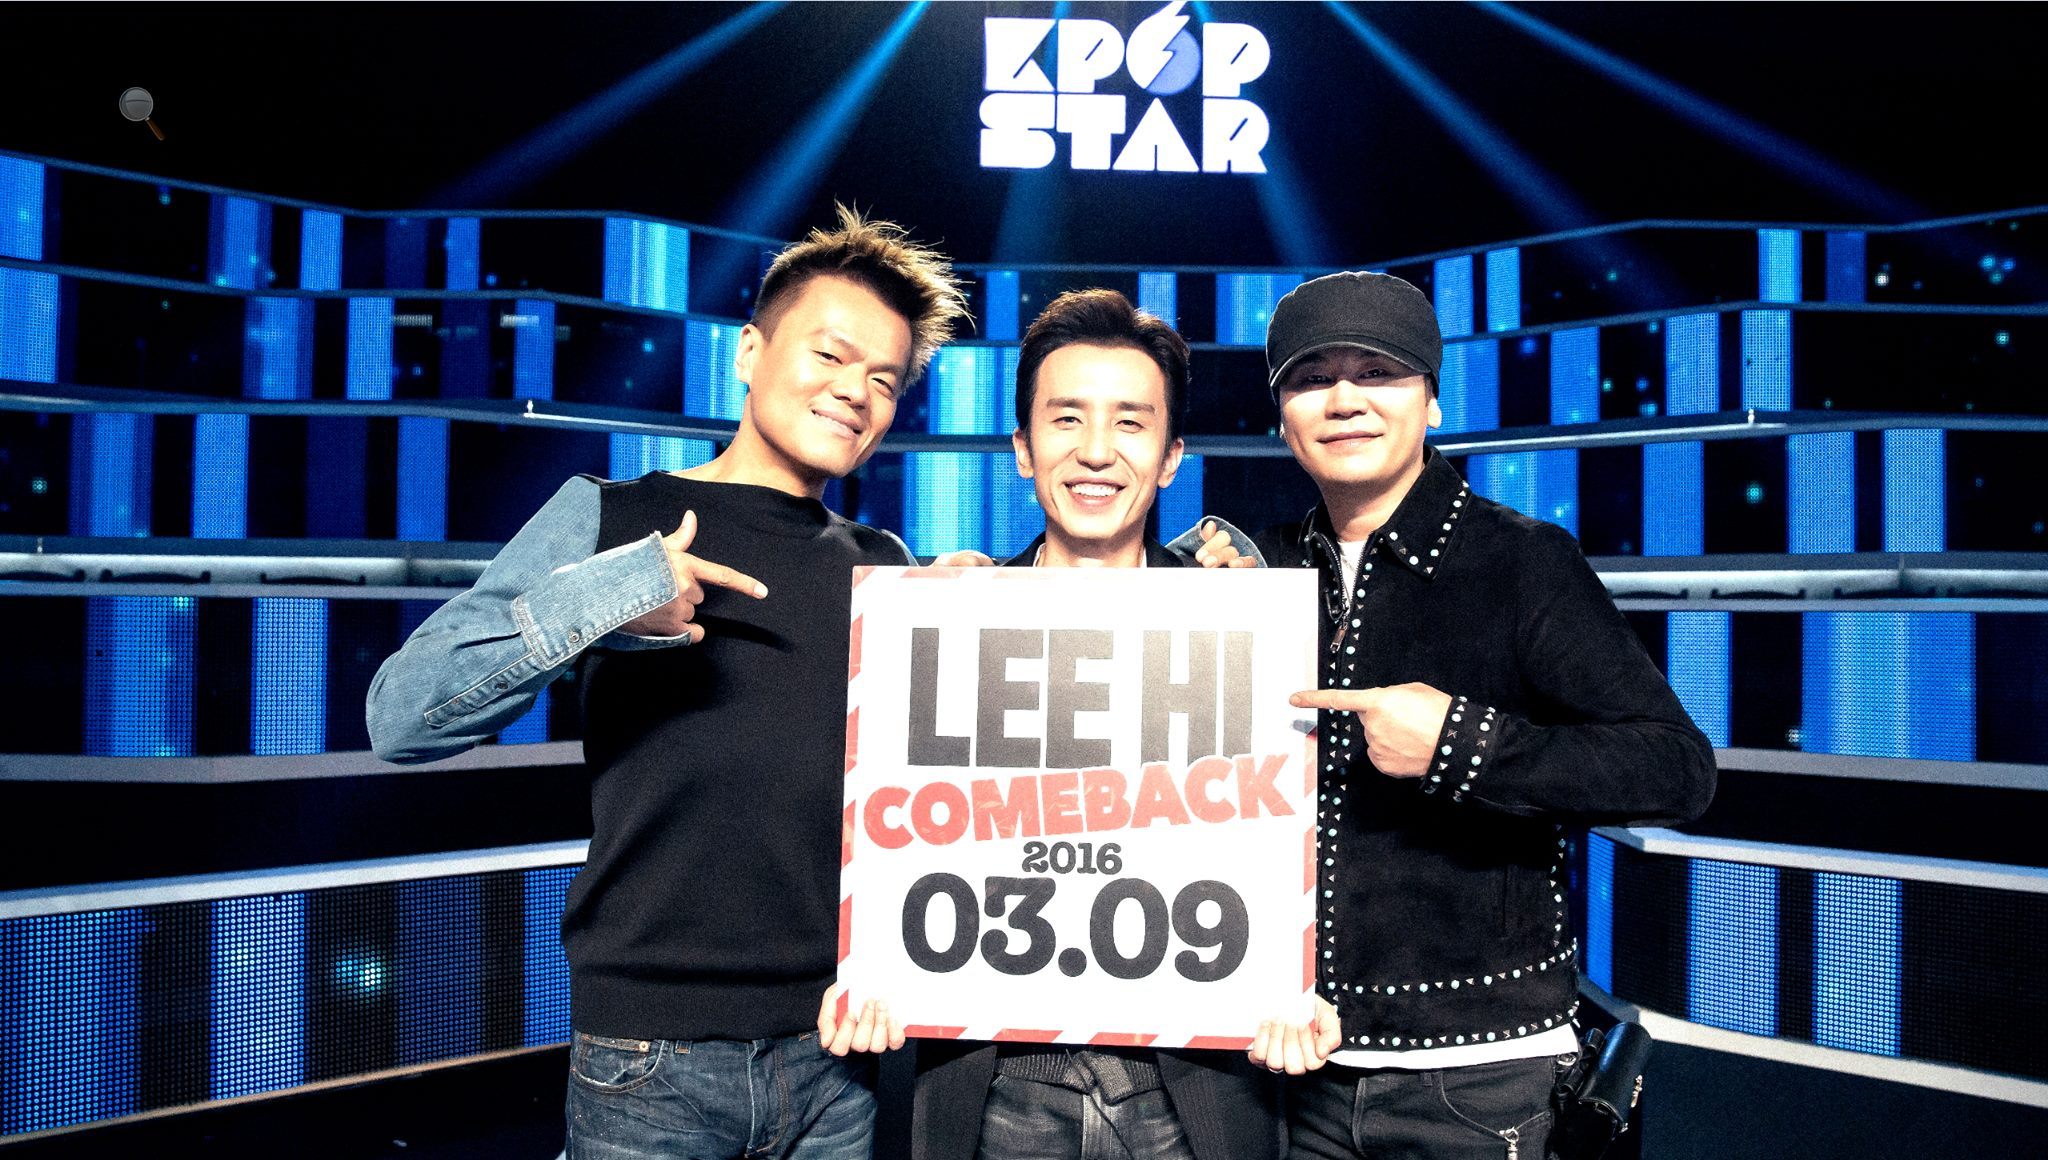 Lee Hi To Make Her Comeback on March 9